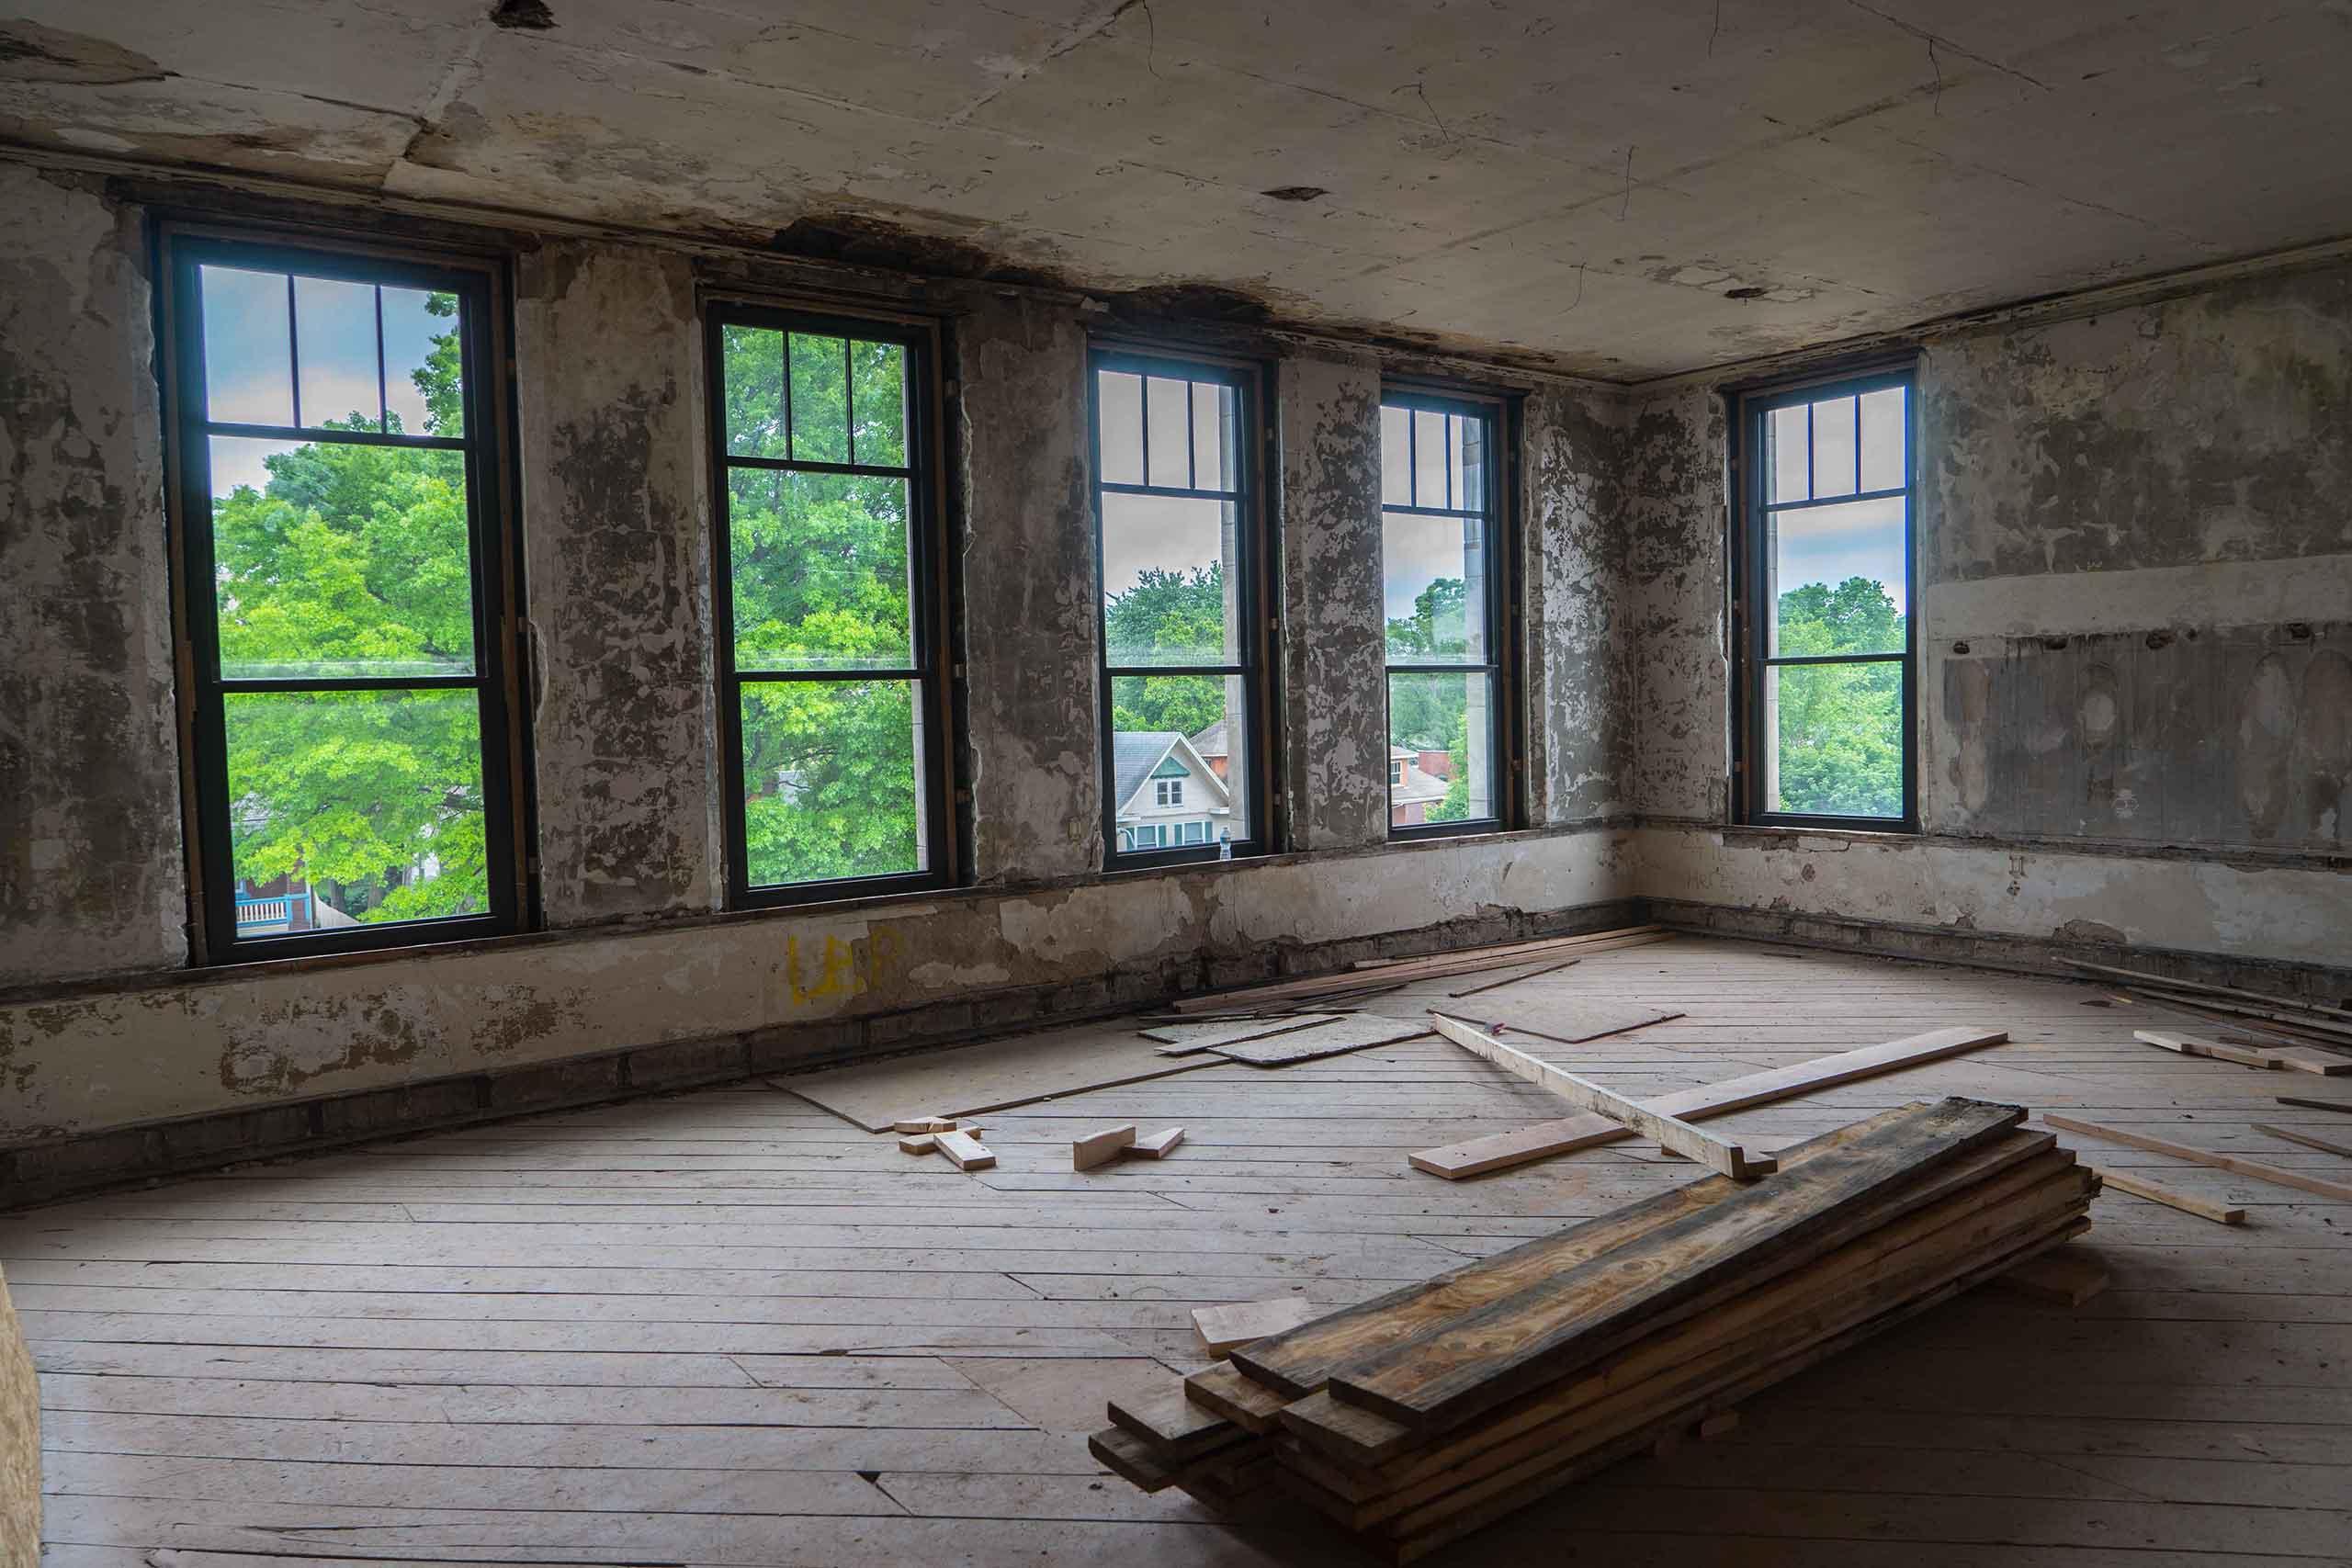 Norman-School-Lofts-Empty-Classroom